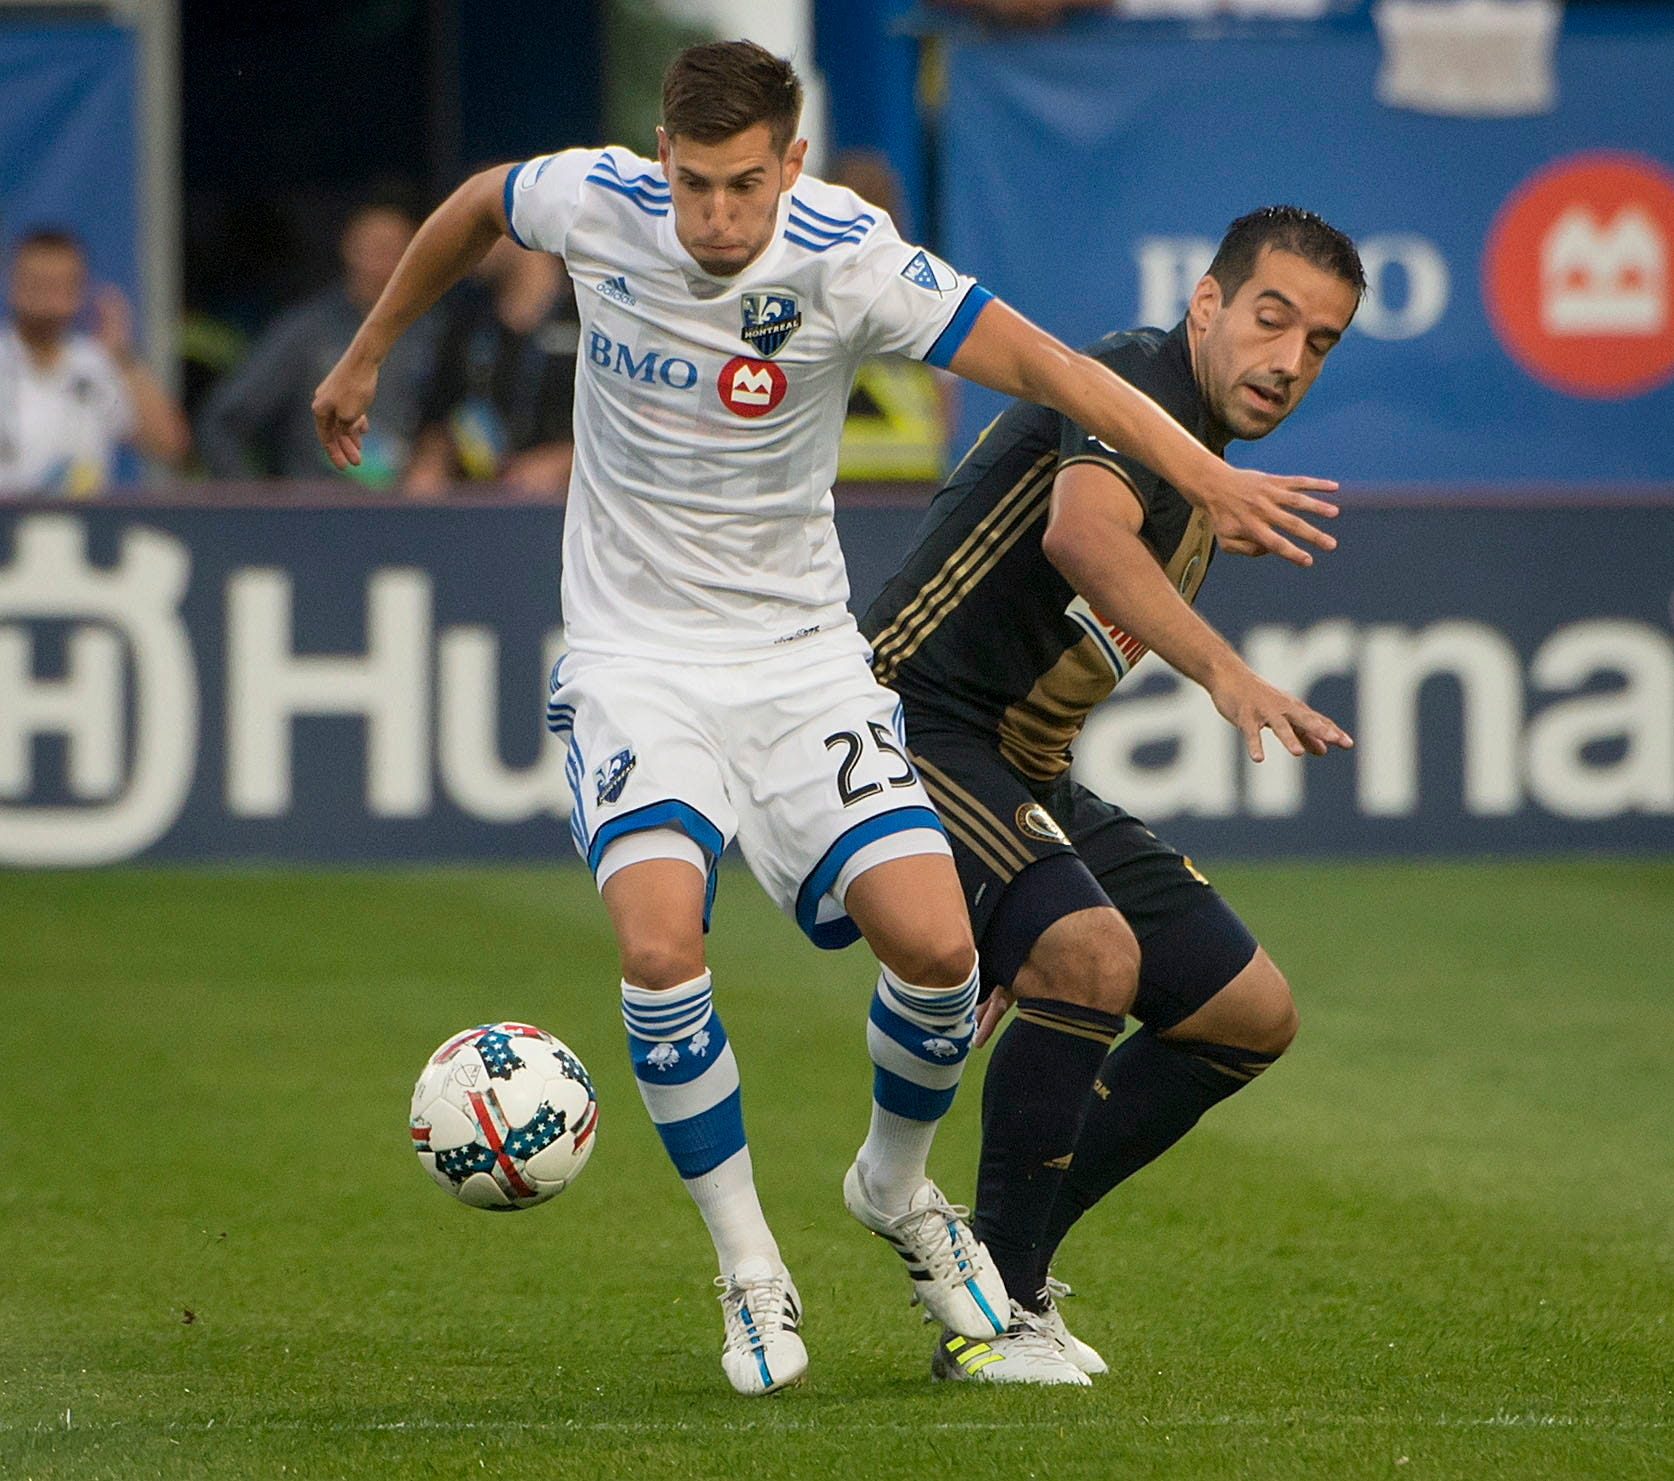 Blerim Dzemaili scores to help Impact beat Union 2-1